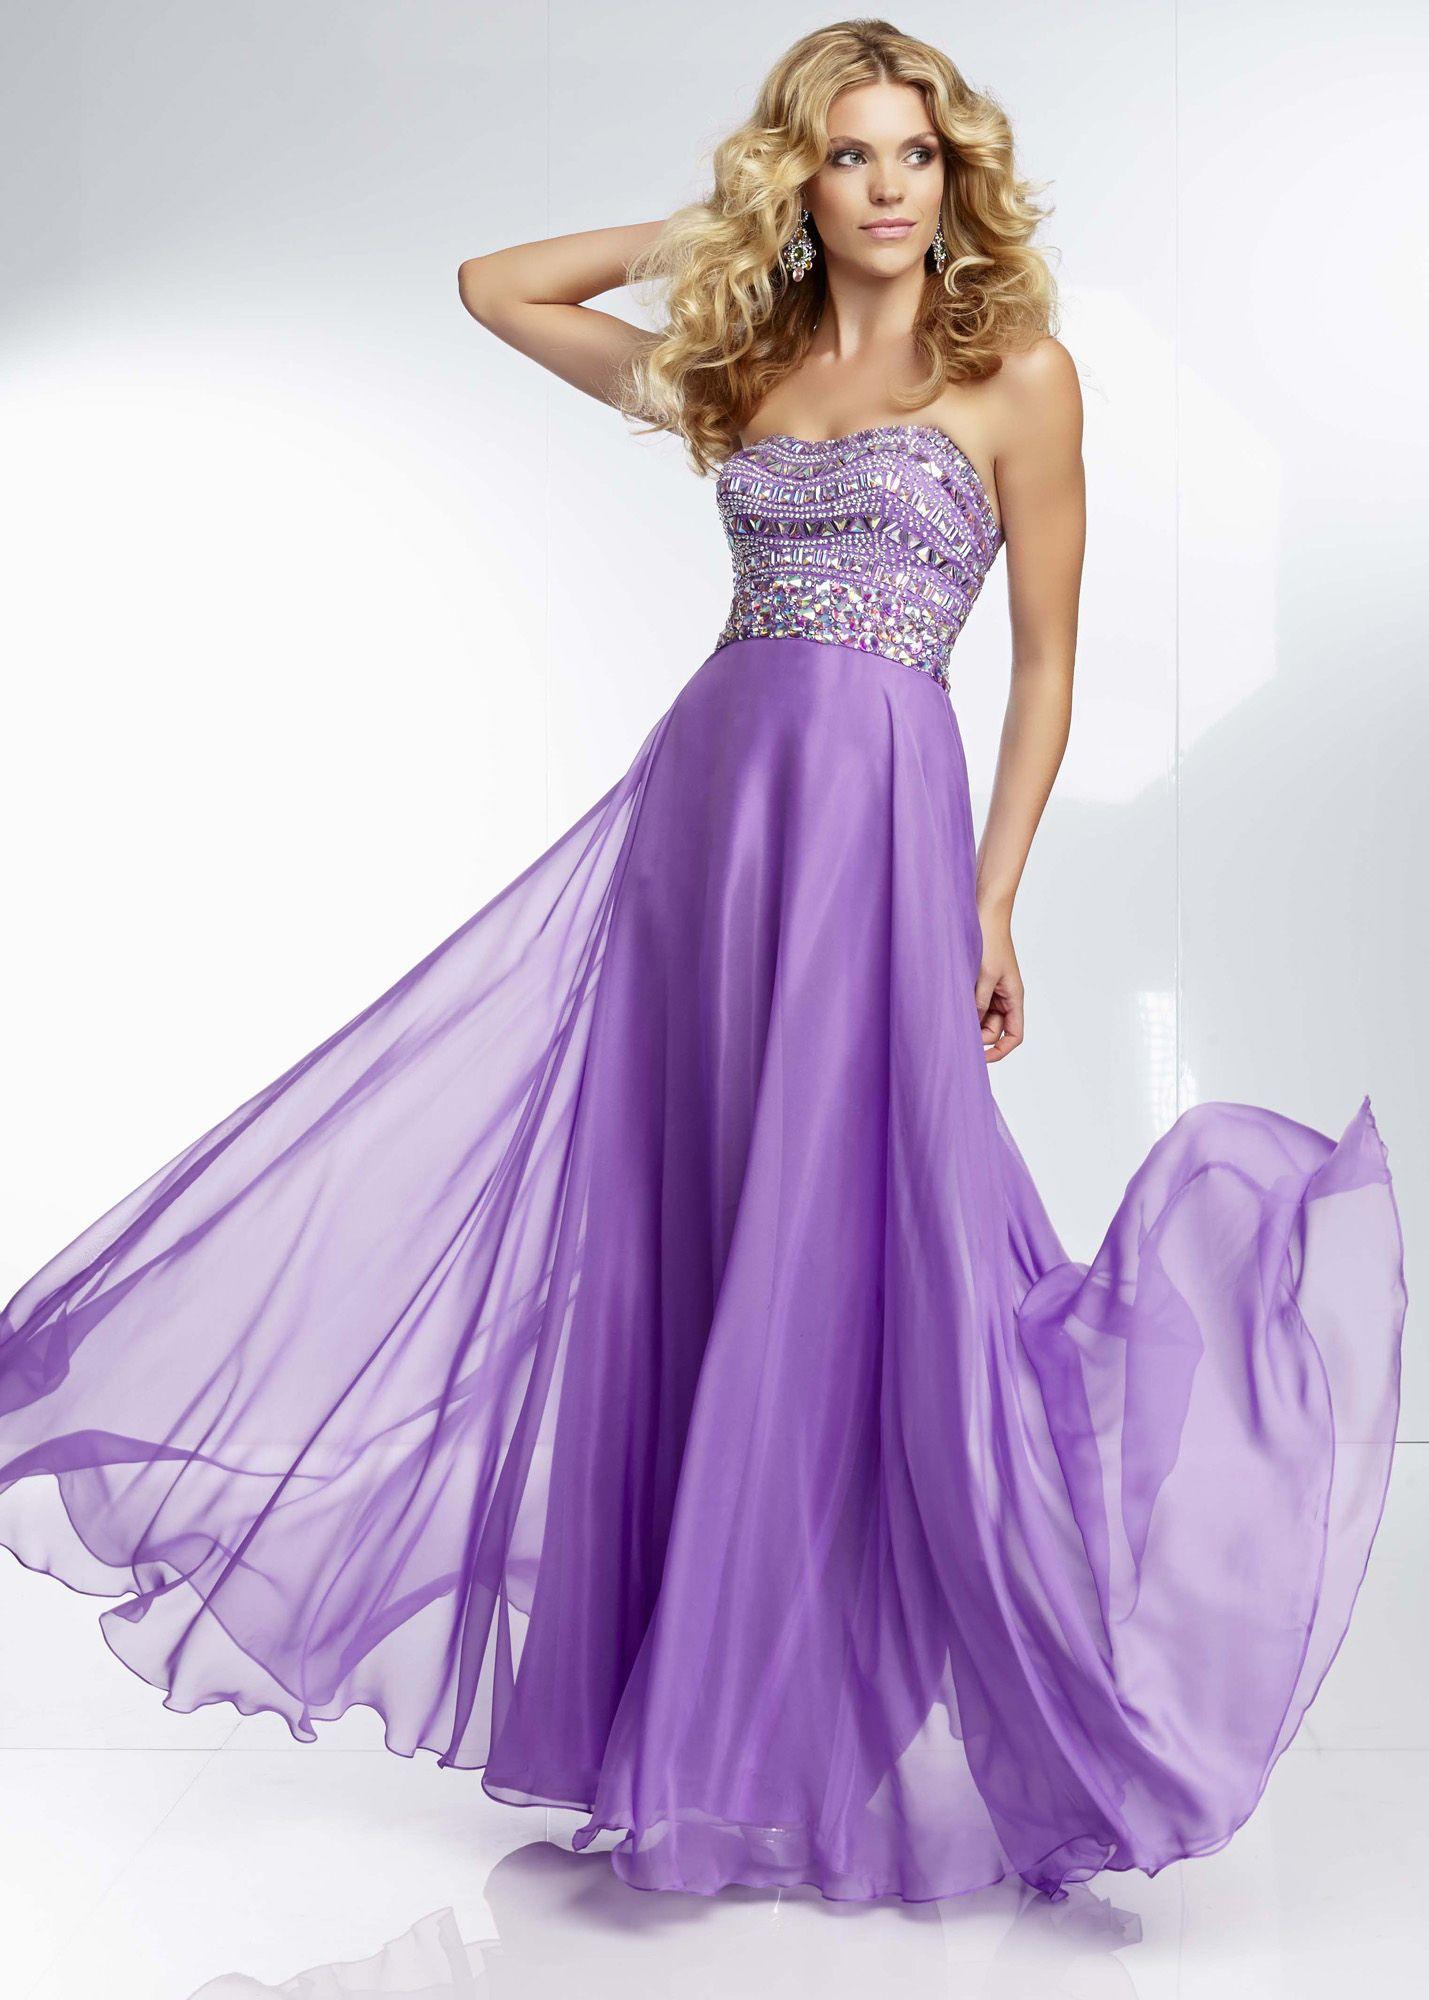 Mori lee purple strapless beaded prom dresses online long